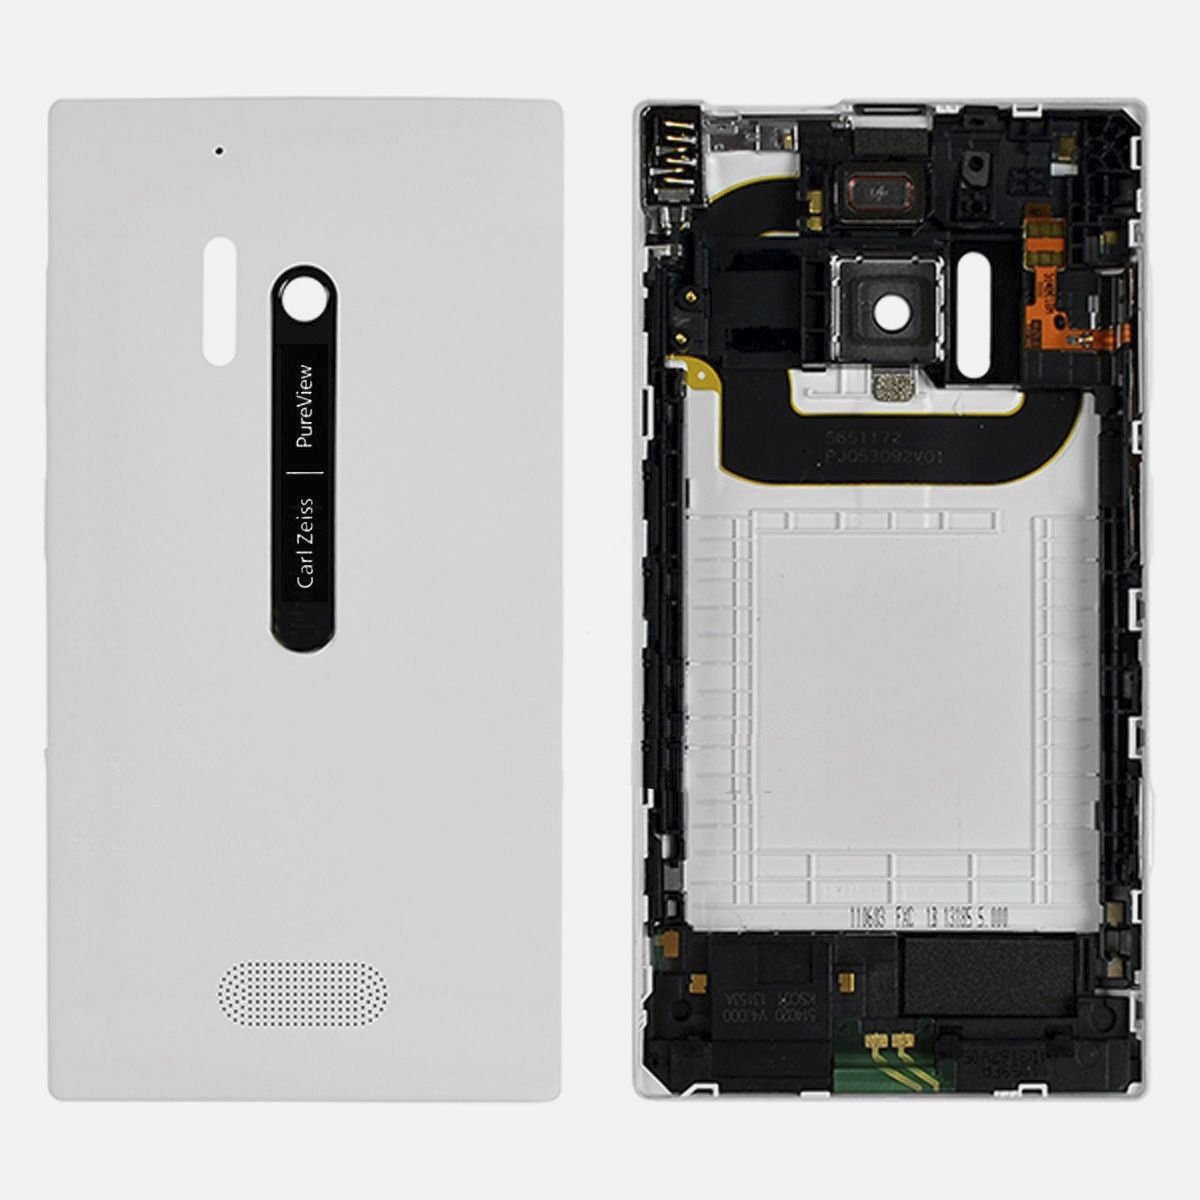 USA OEM Nokia Lumia 928 Back Cover Housing with Camera Lens & Button Keys White